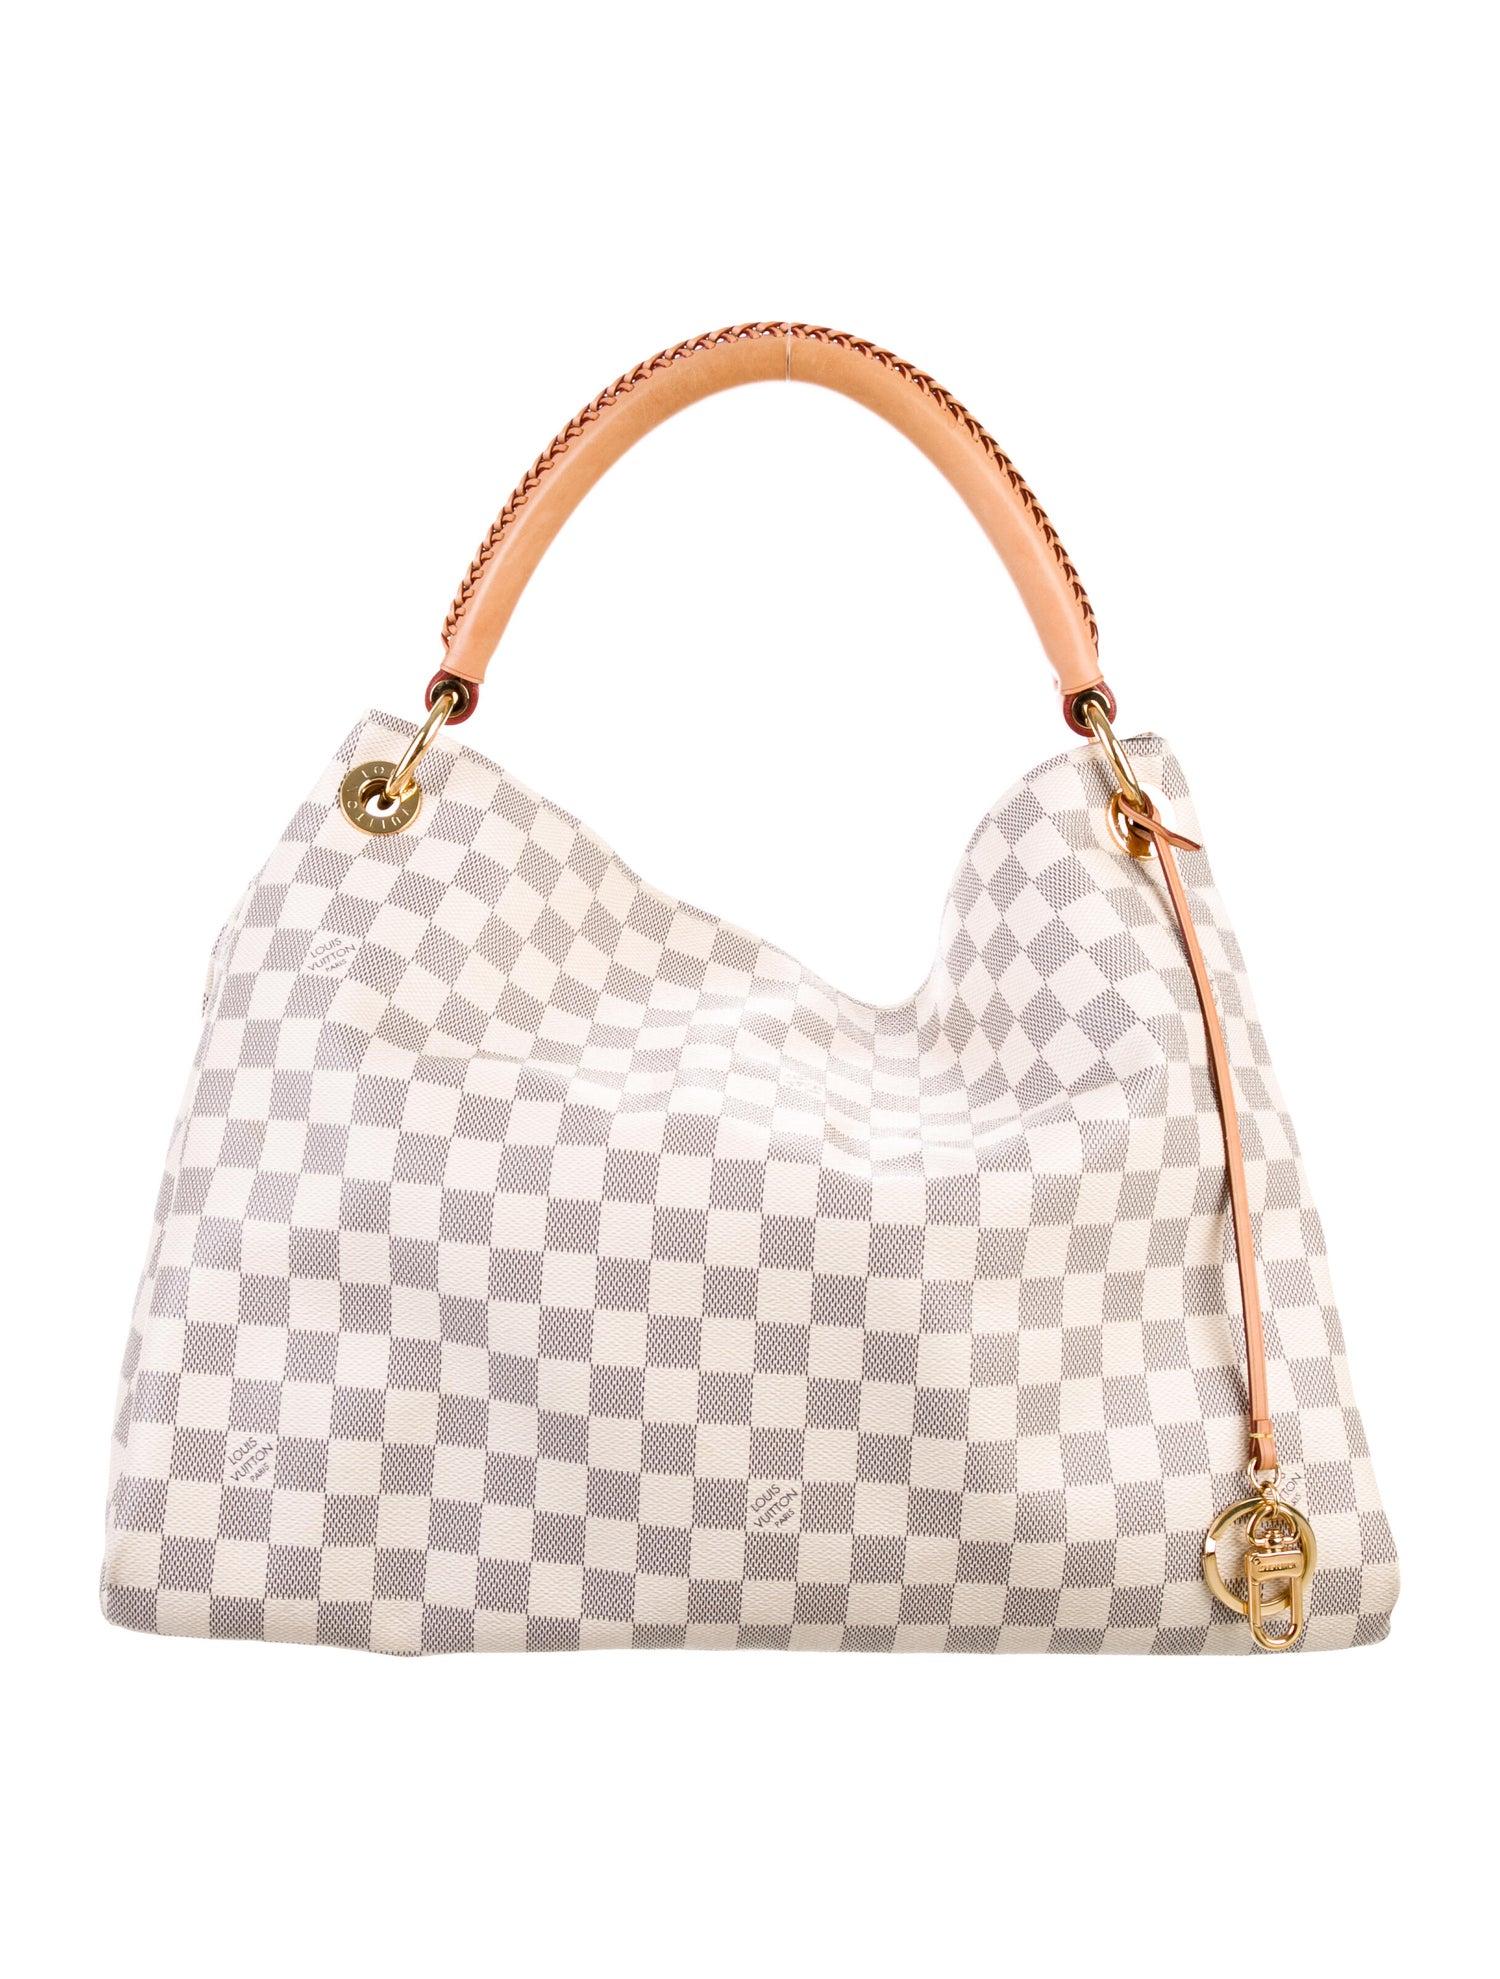 Louis-Vuitton-Artsy-MM-Damier-Azur_16199A.jpg